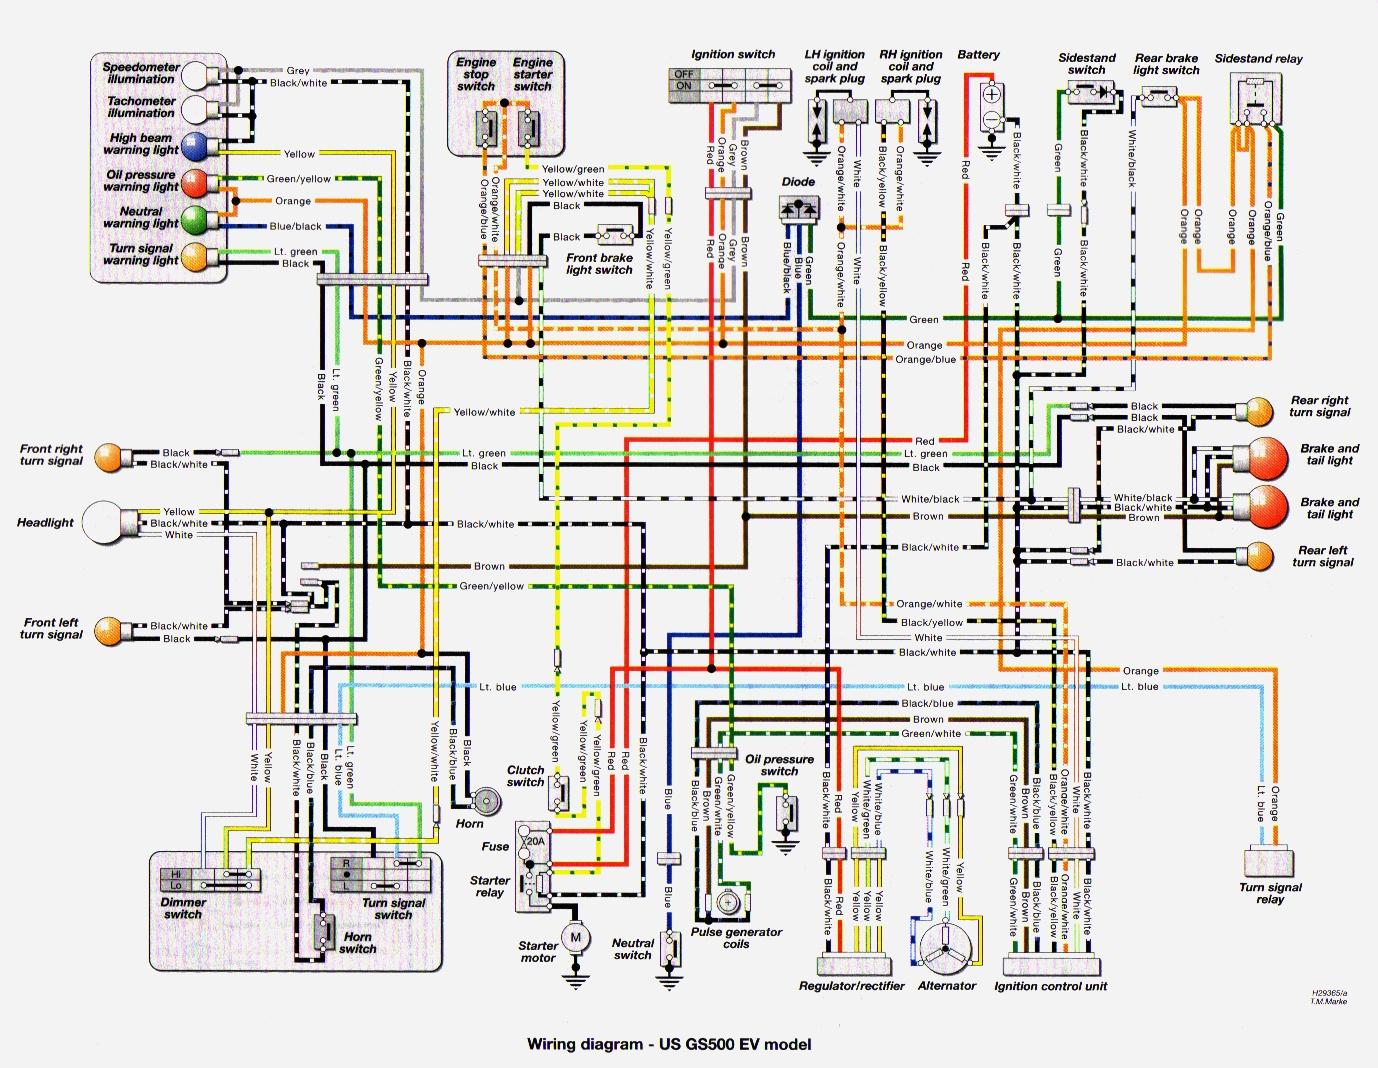 hight resolution of 97 ford 7 3 glow plug relay wiring diagram 97 free 97 f250 powerstroke wiring diagram